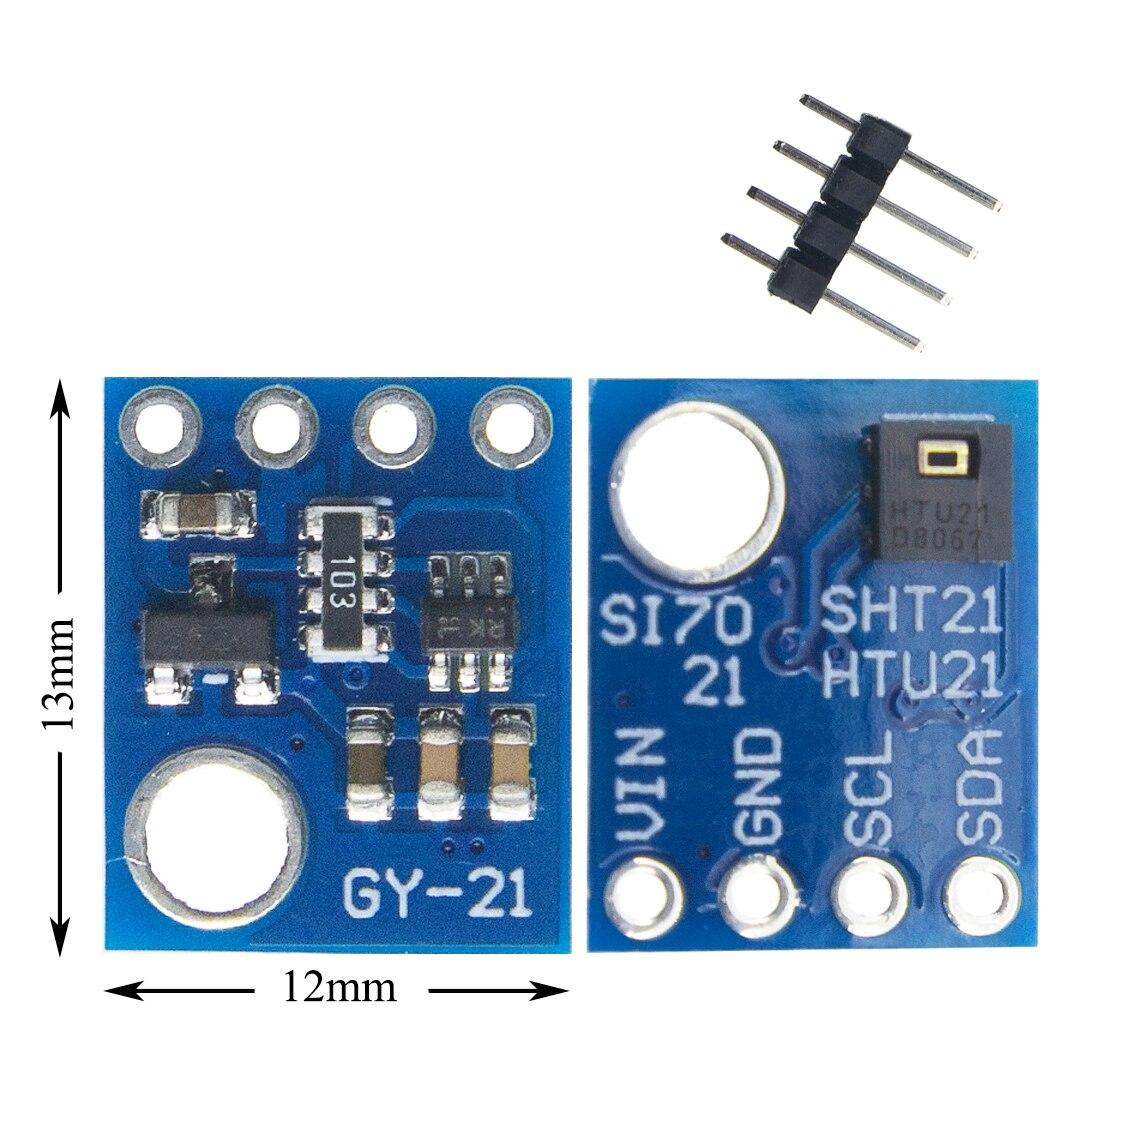 1 Pcs Vochtigheid Sensor Met I2C Interface Si7021 GY-21 HTU21 Forarduino-Industriële Hoge Precisie